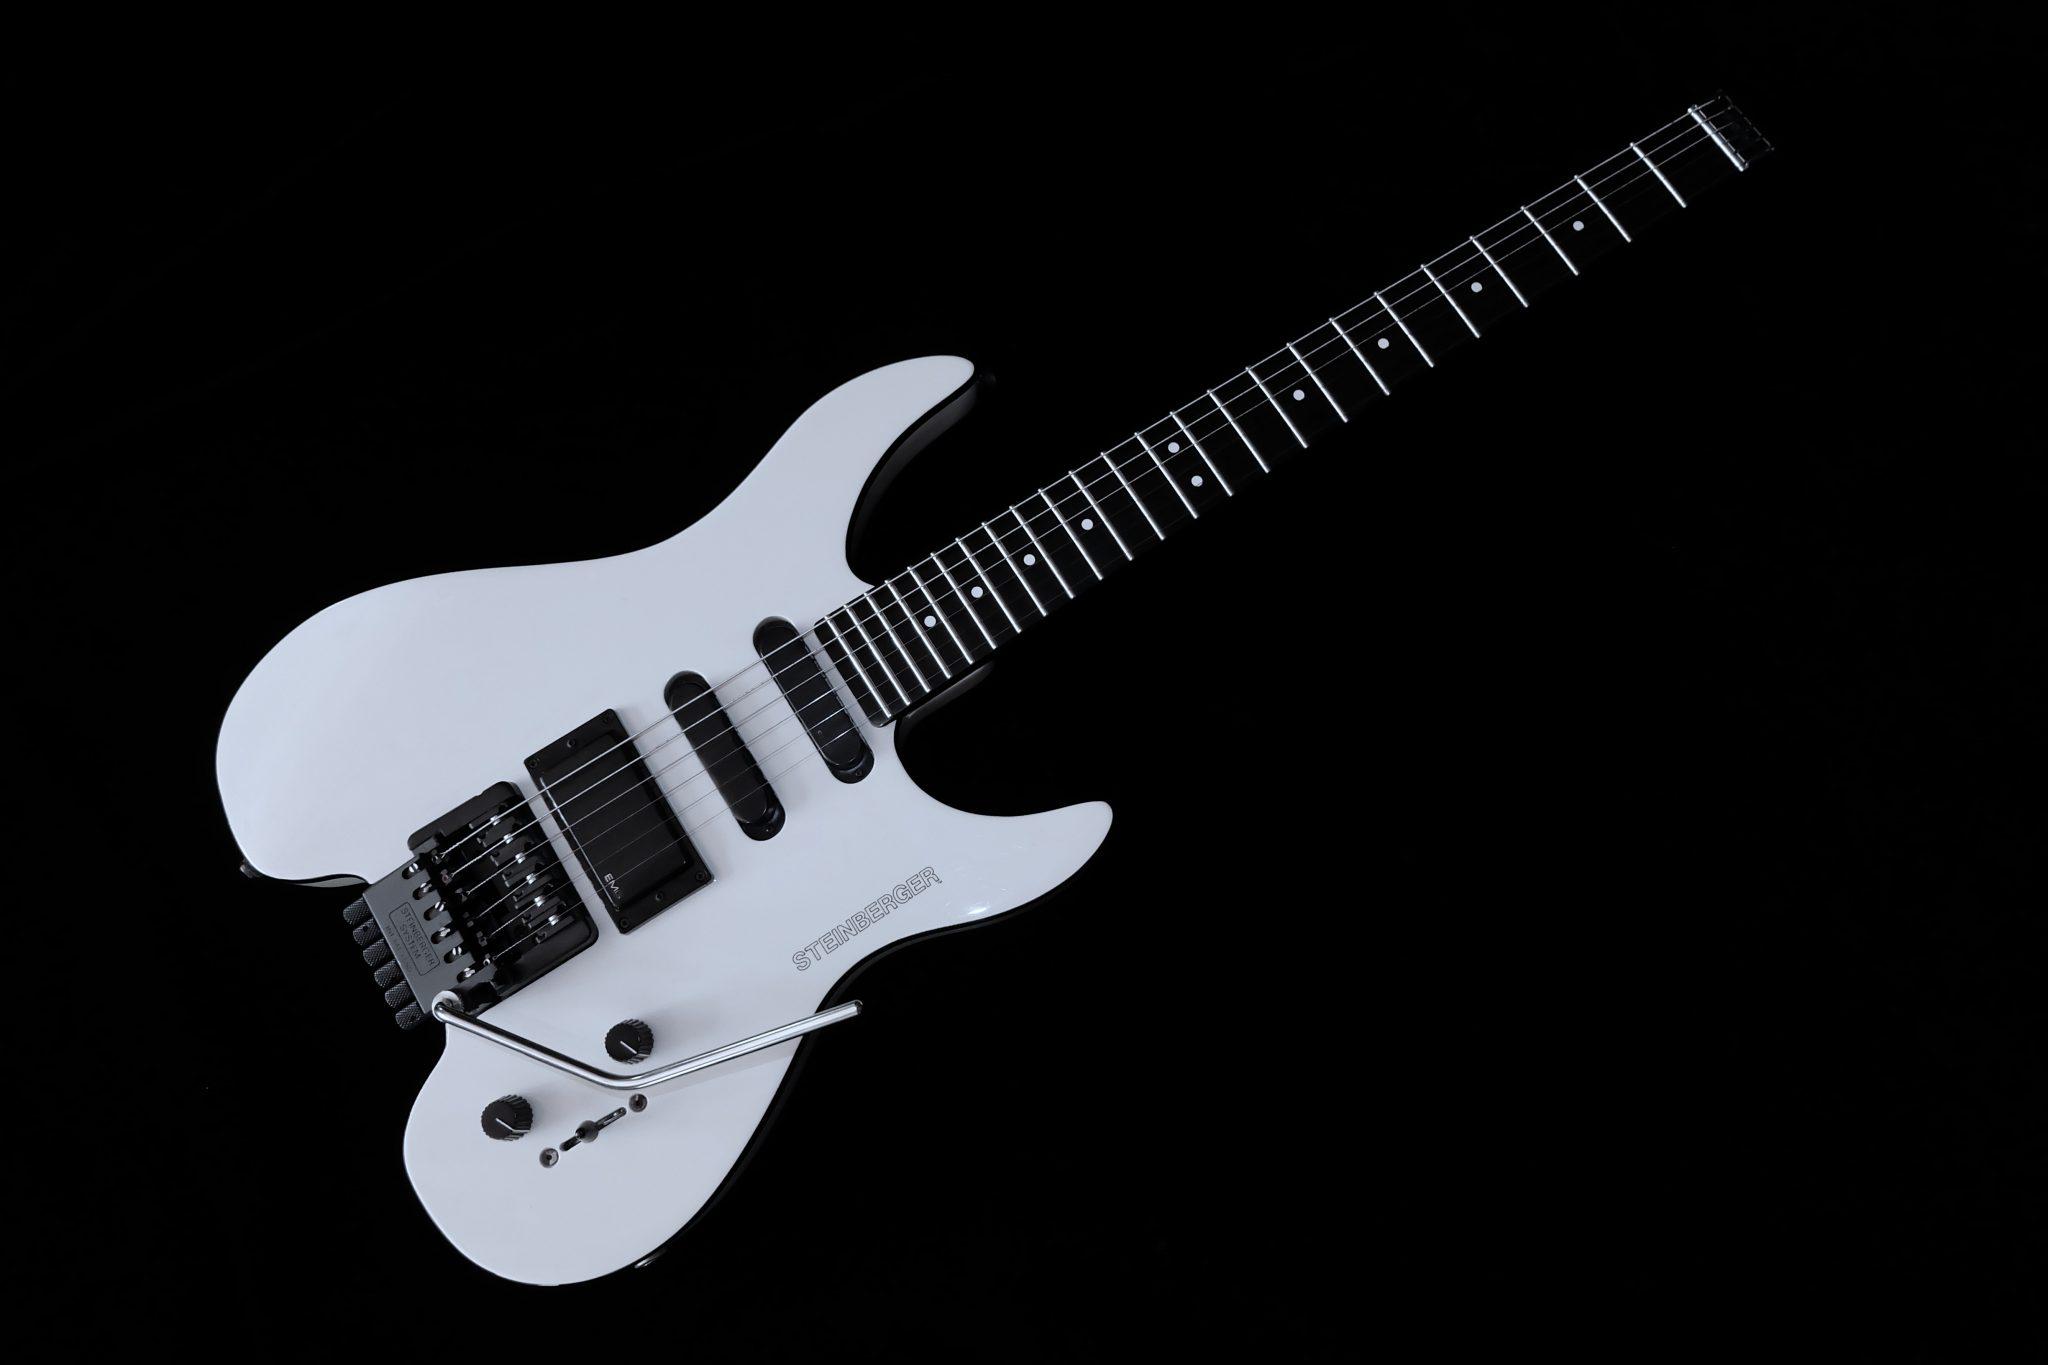 Electric Guitars Vintage Alley Music Bridge Tremolo Fender Semi Updown Chrome Steinberger Gm 4 Standard White